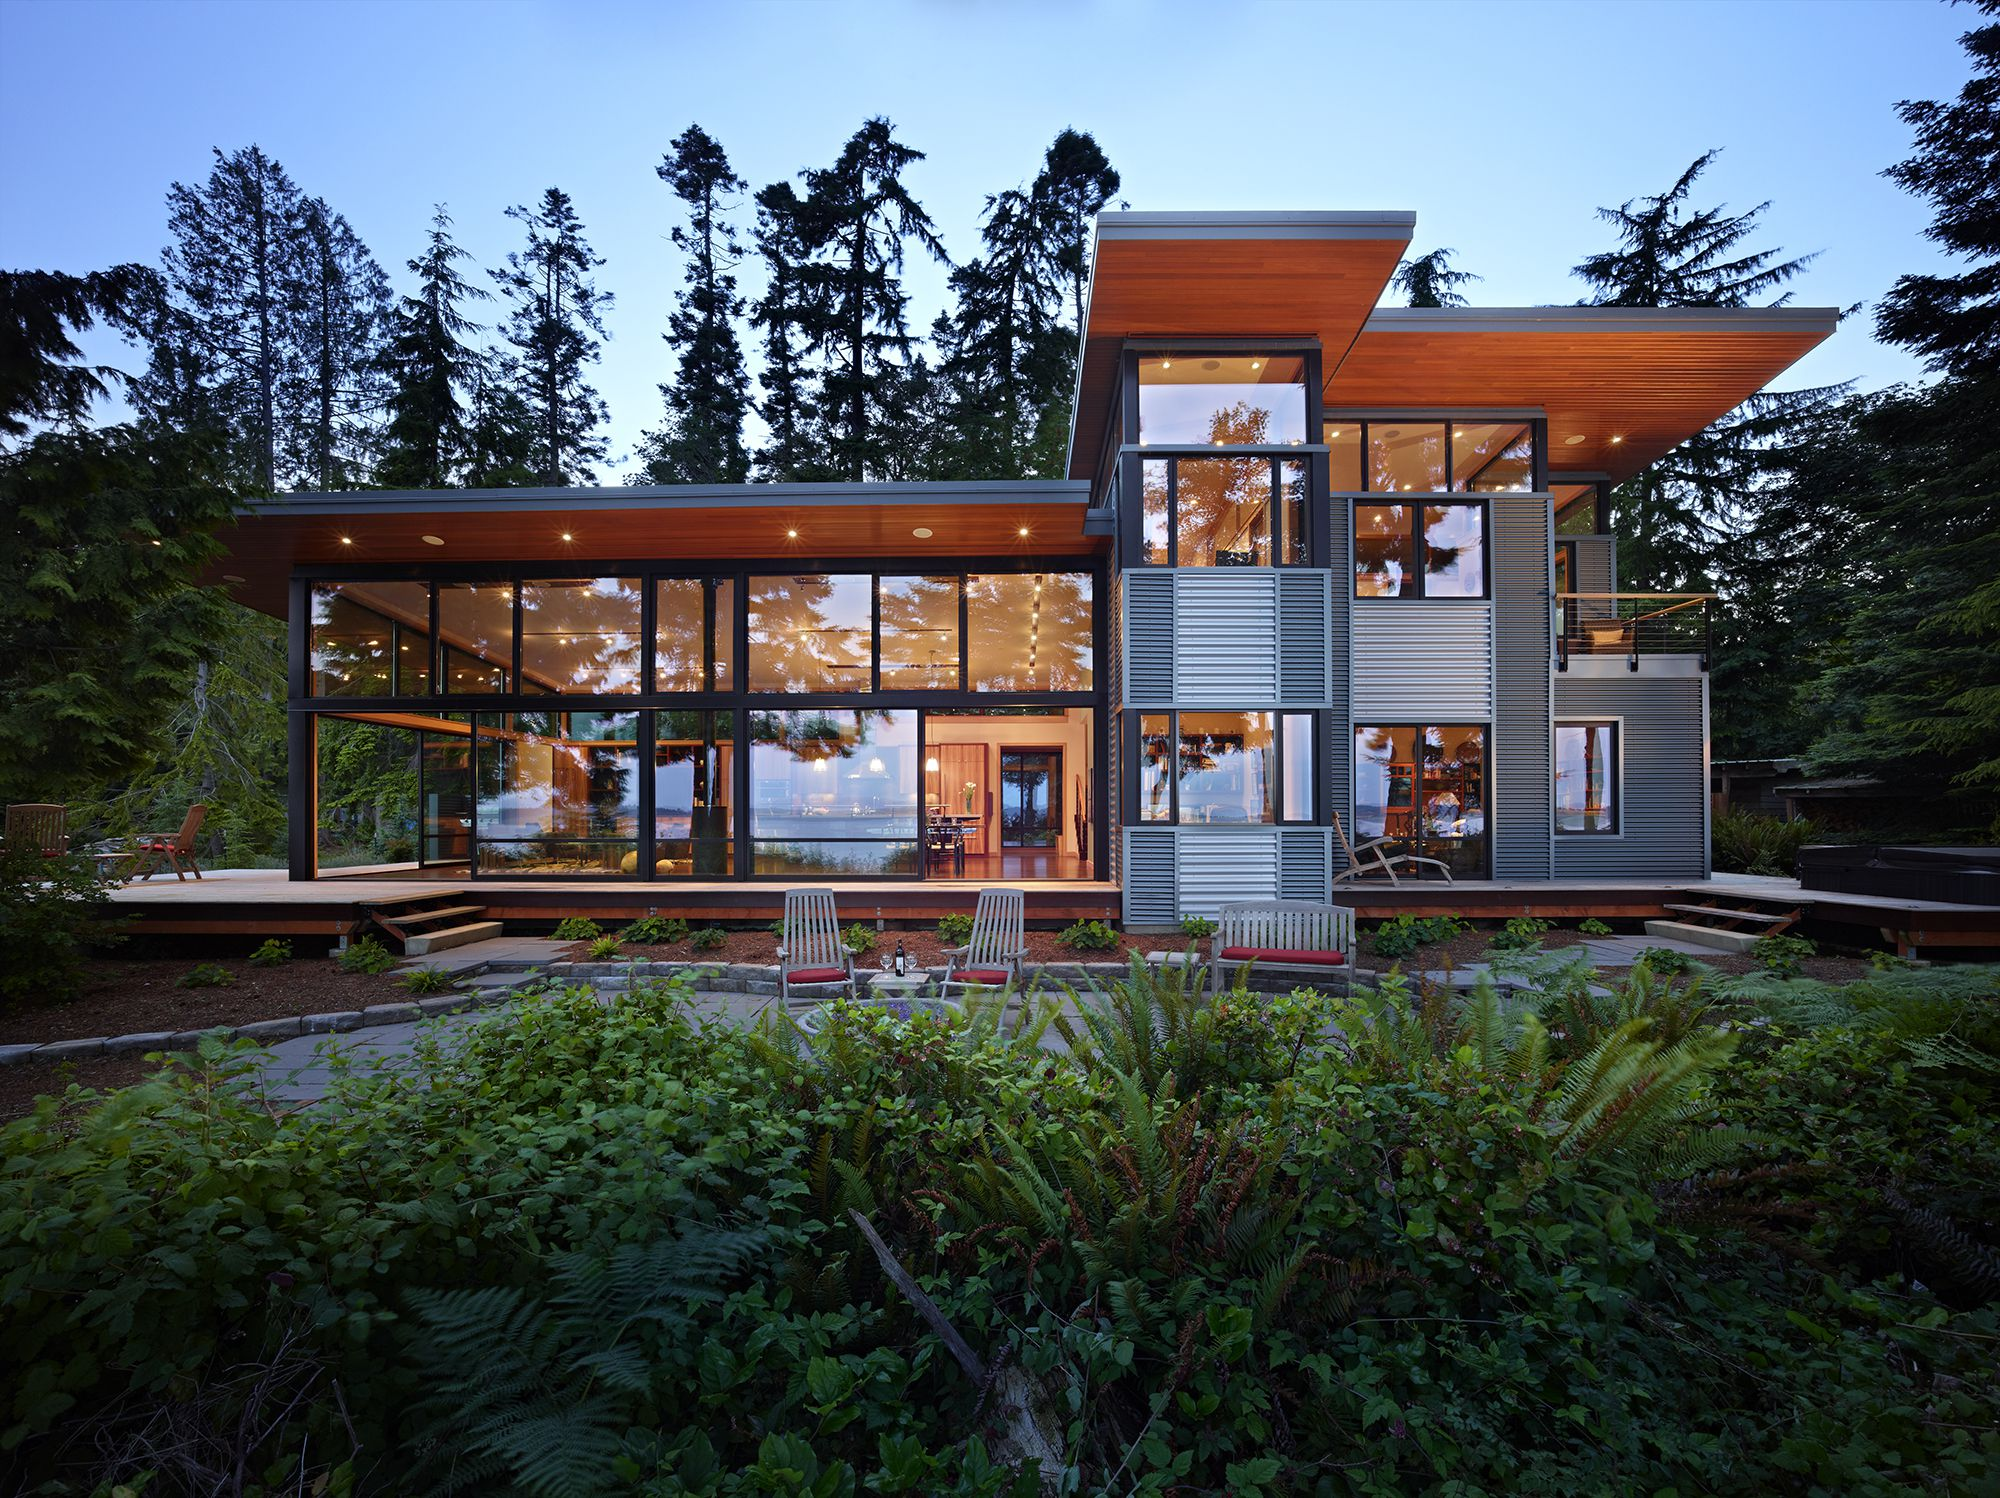 100 steel building homes floor plans house plan morton steel building homes floor plans metal homes designs interior design ideas